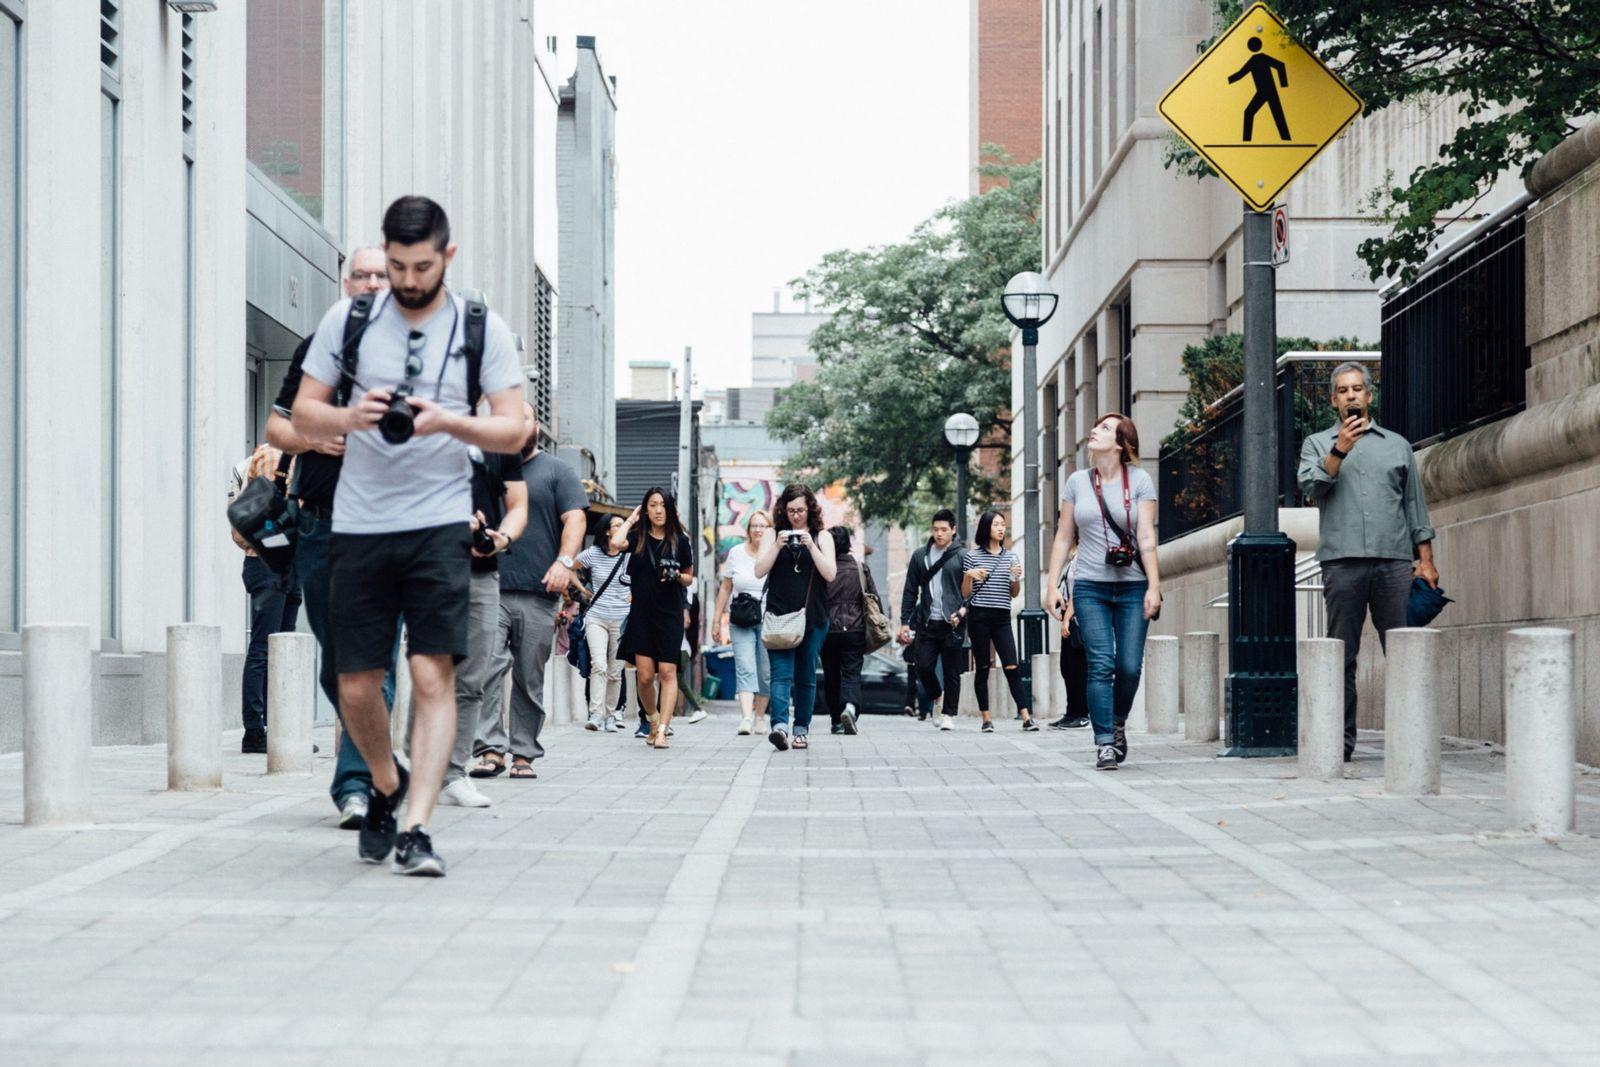 Pedestrians walking in city